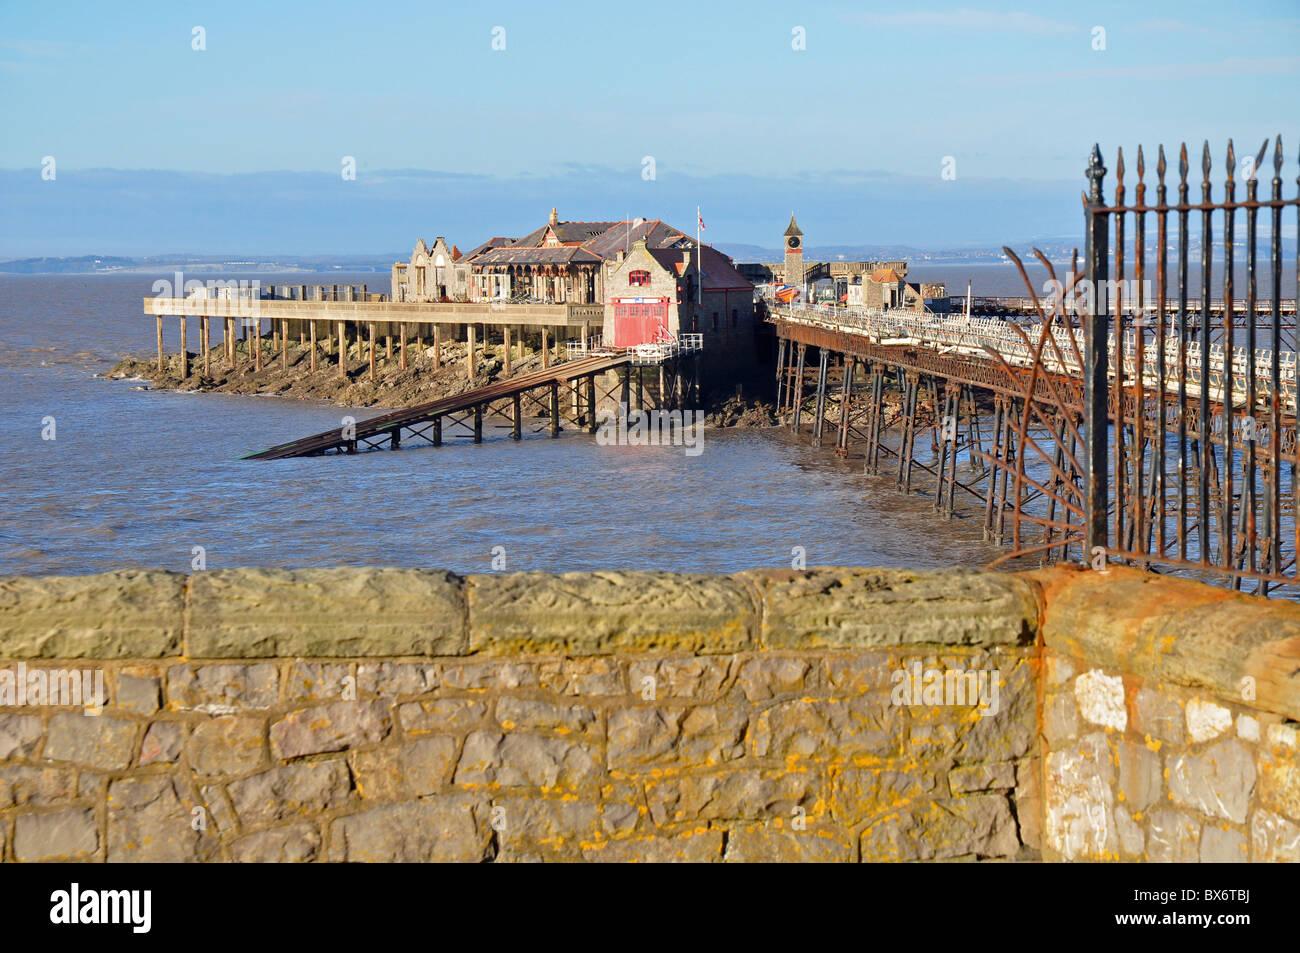 Weston super Mare, Somerset, England: Birnbeck pier - Stock Image